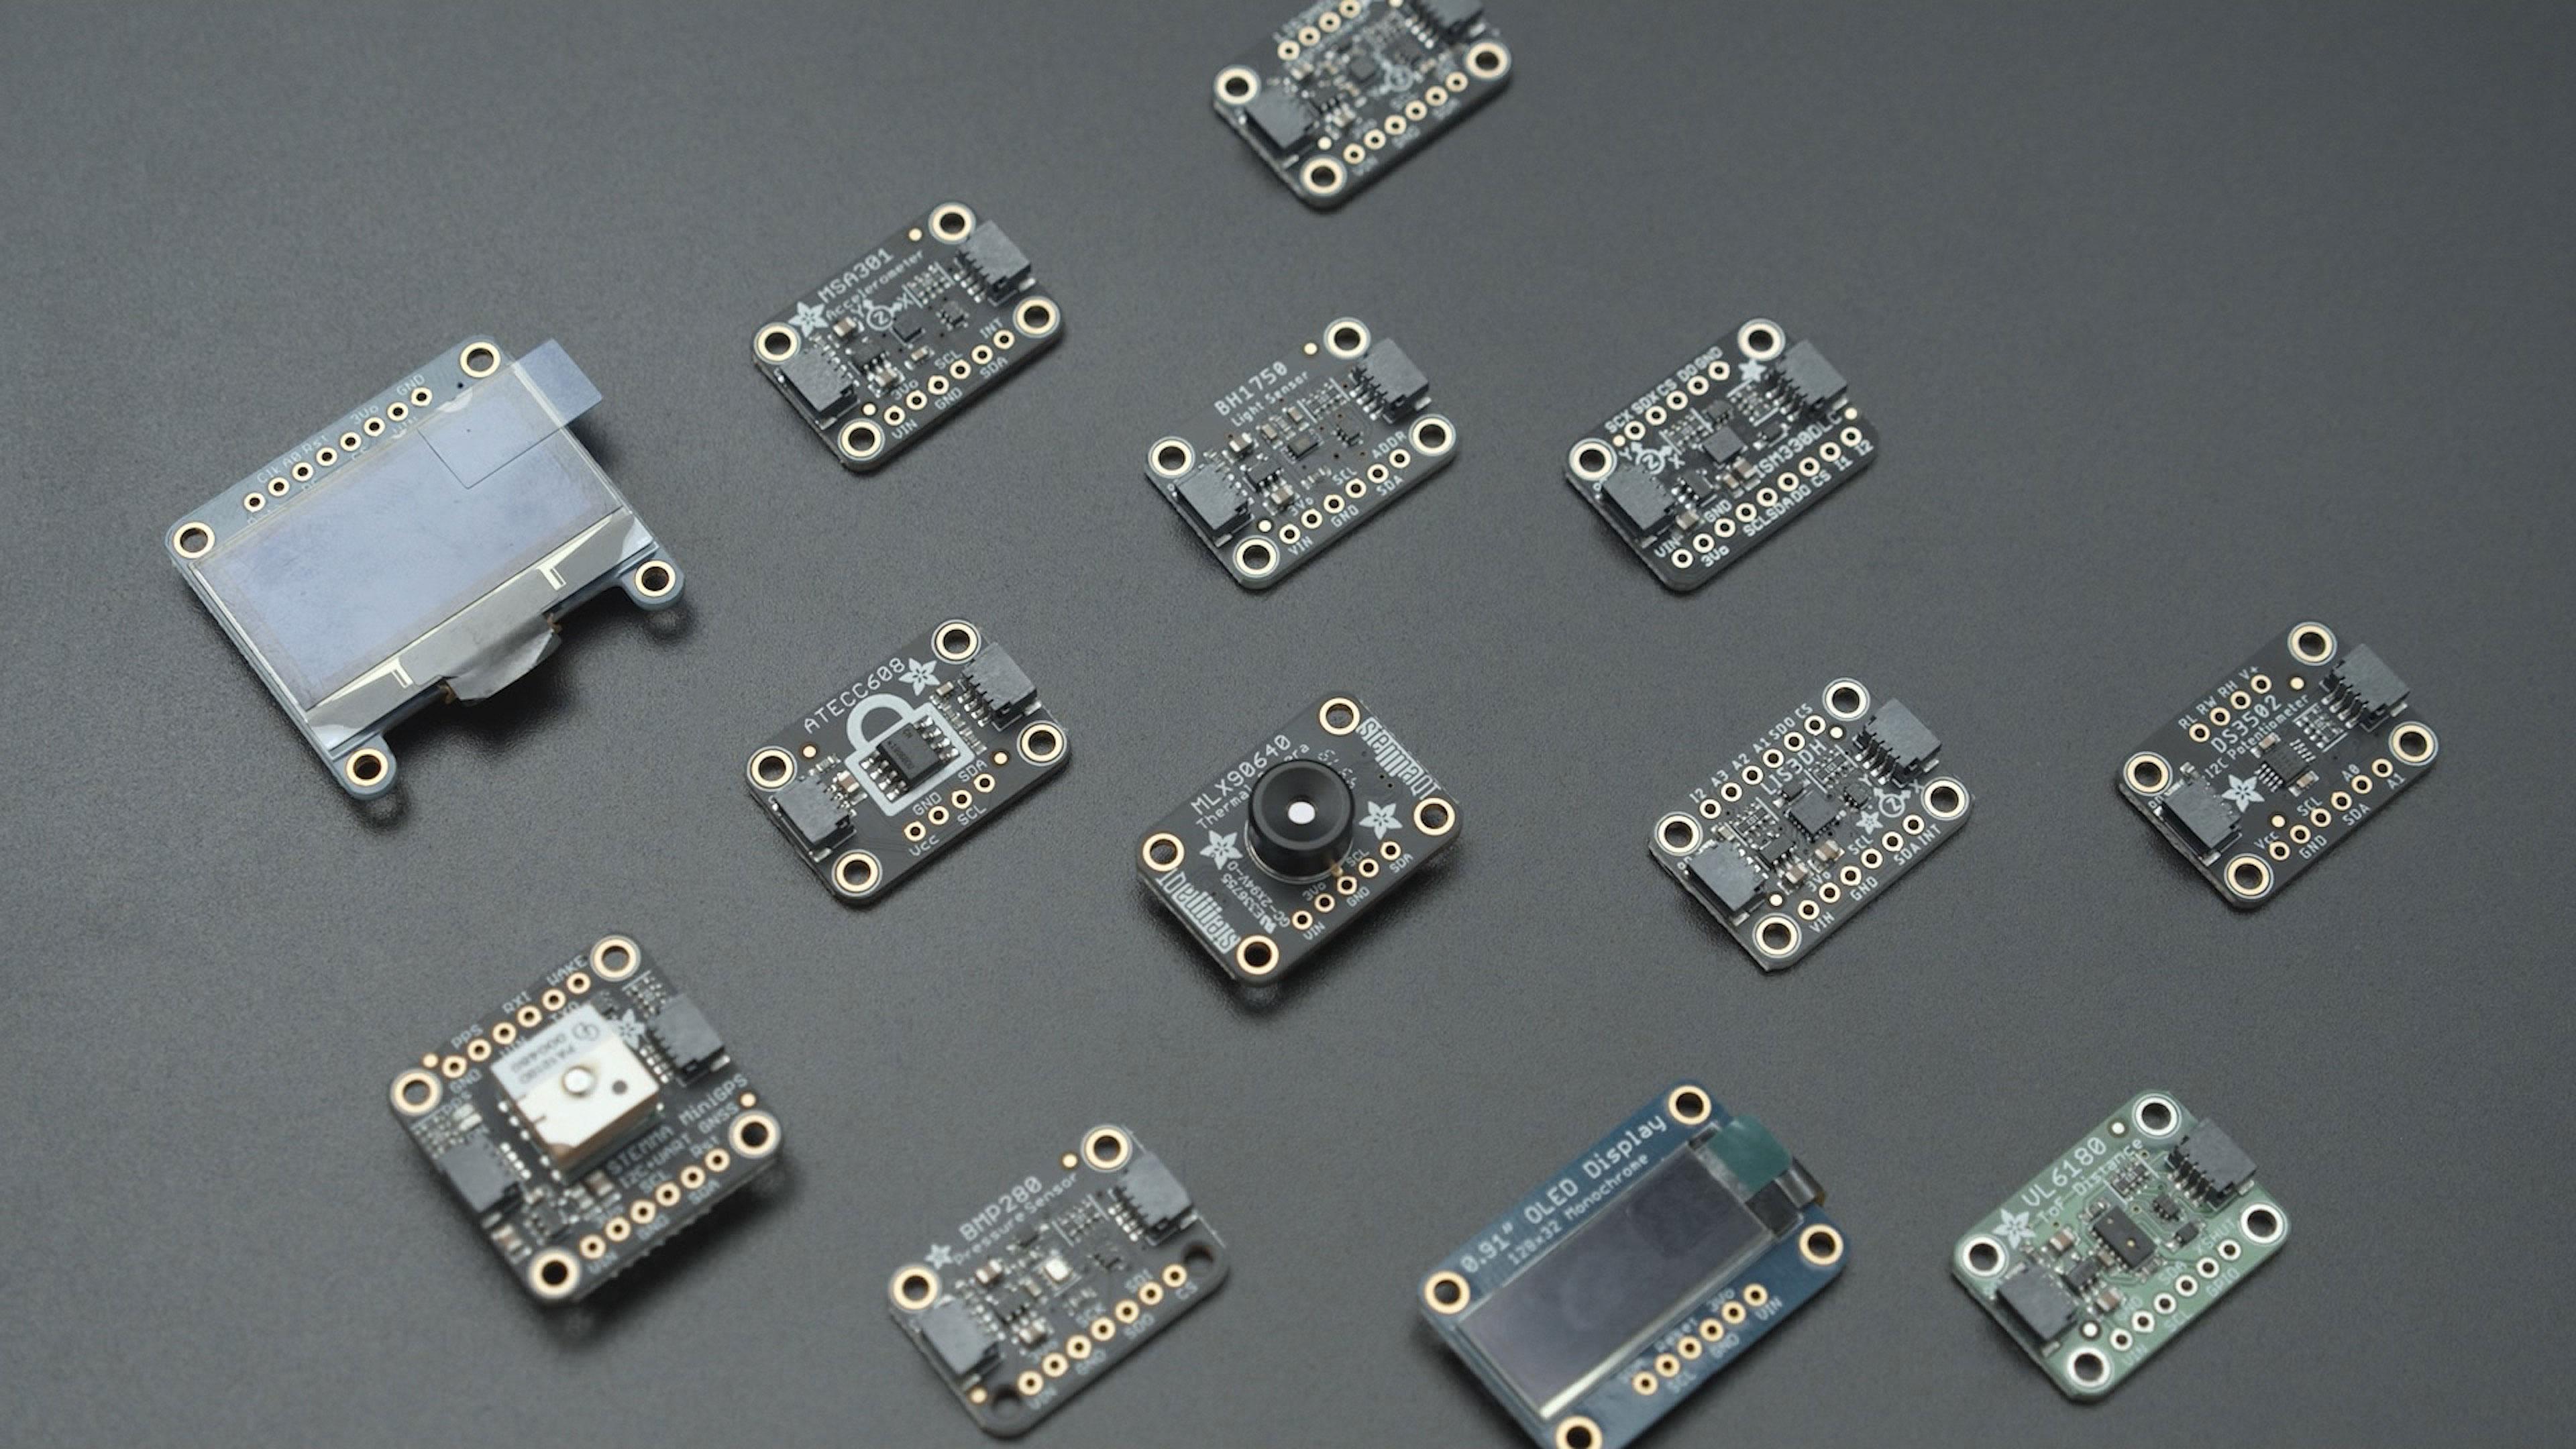 3d_printing_all-boards.jpg